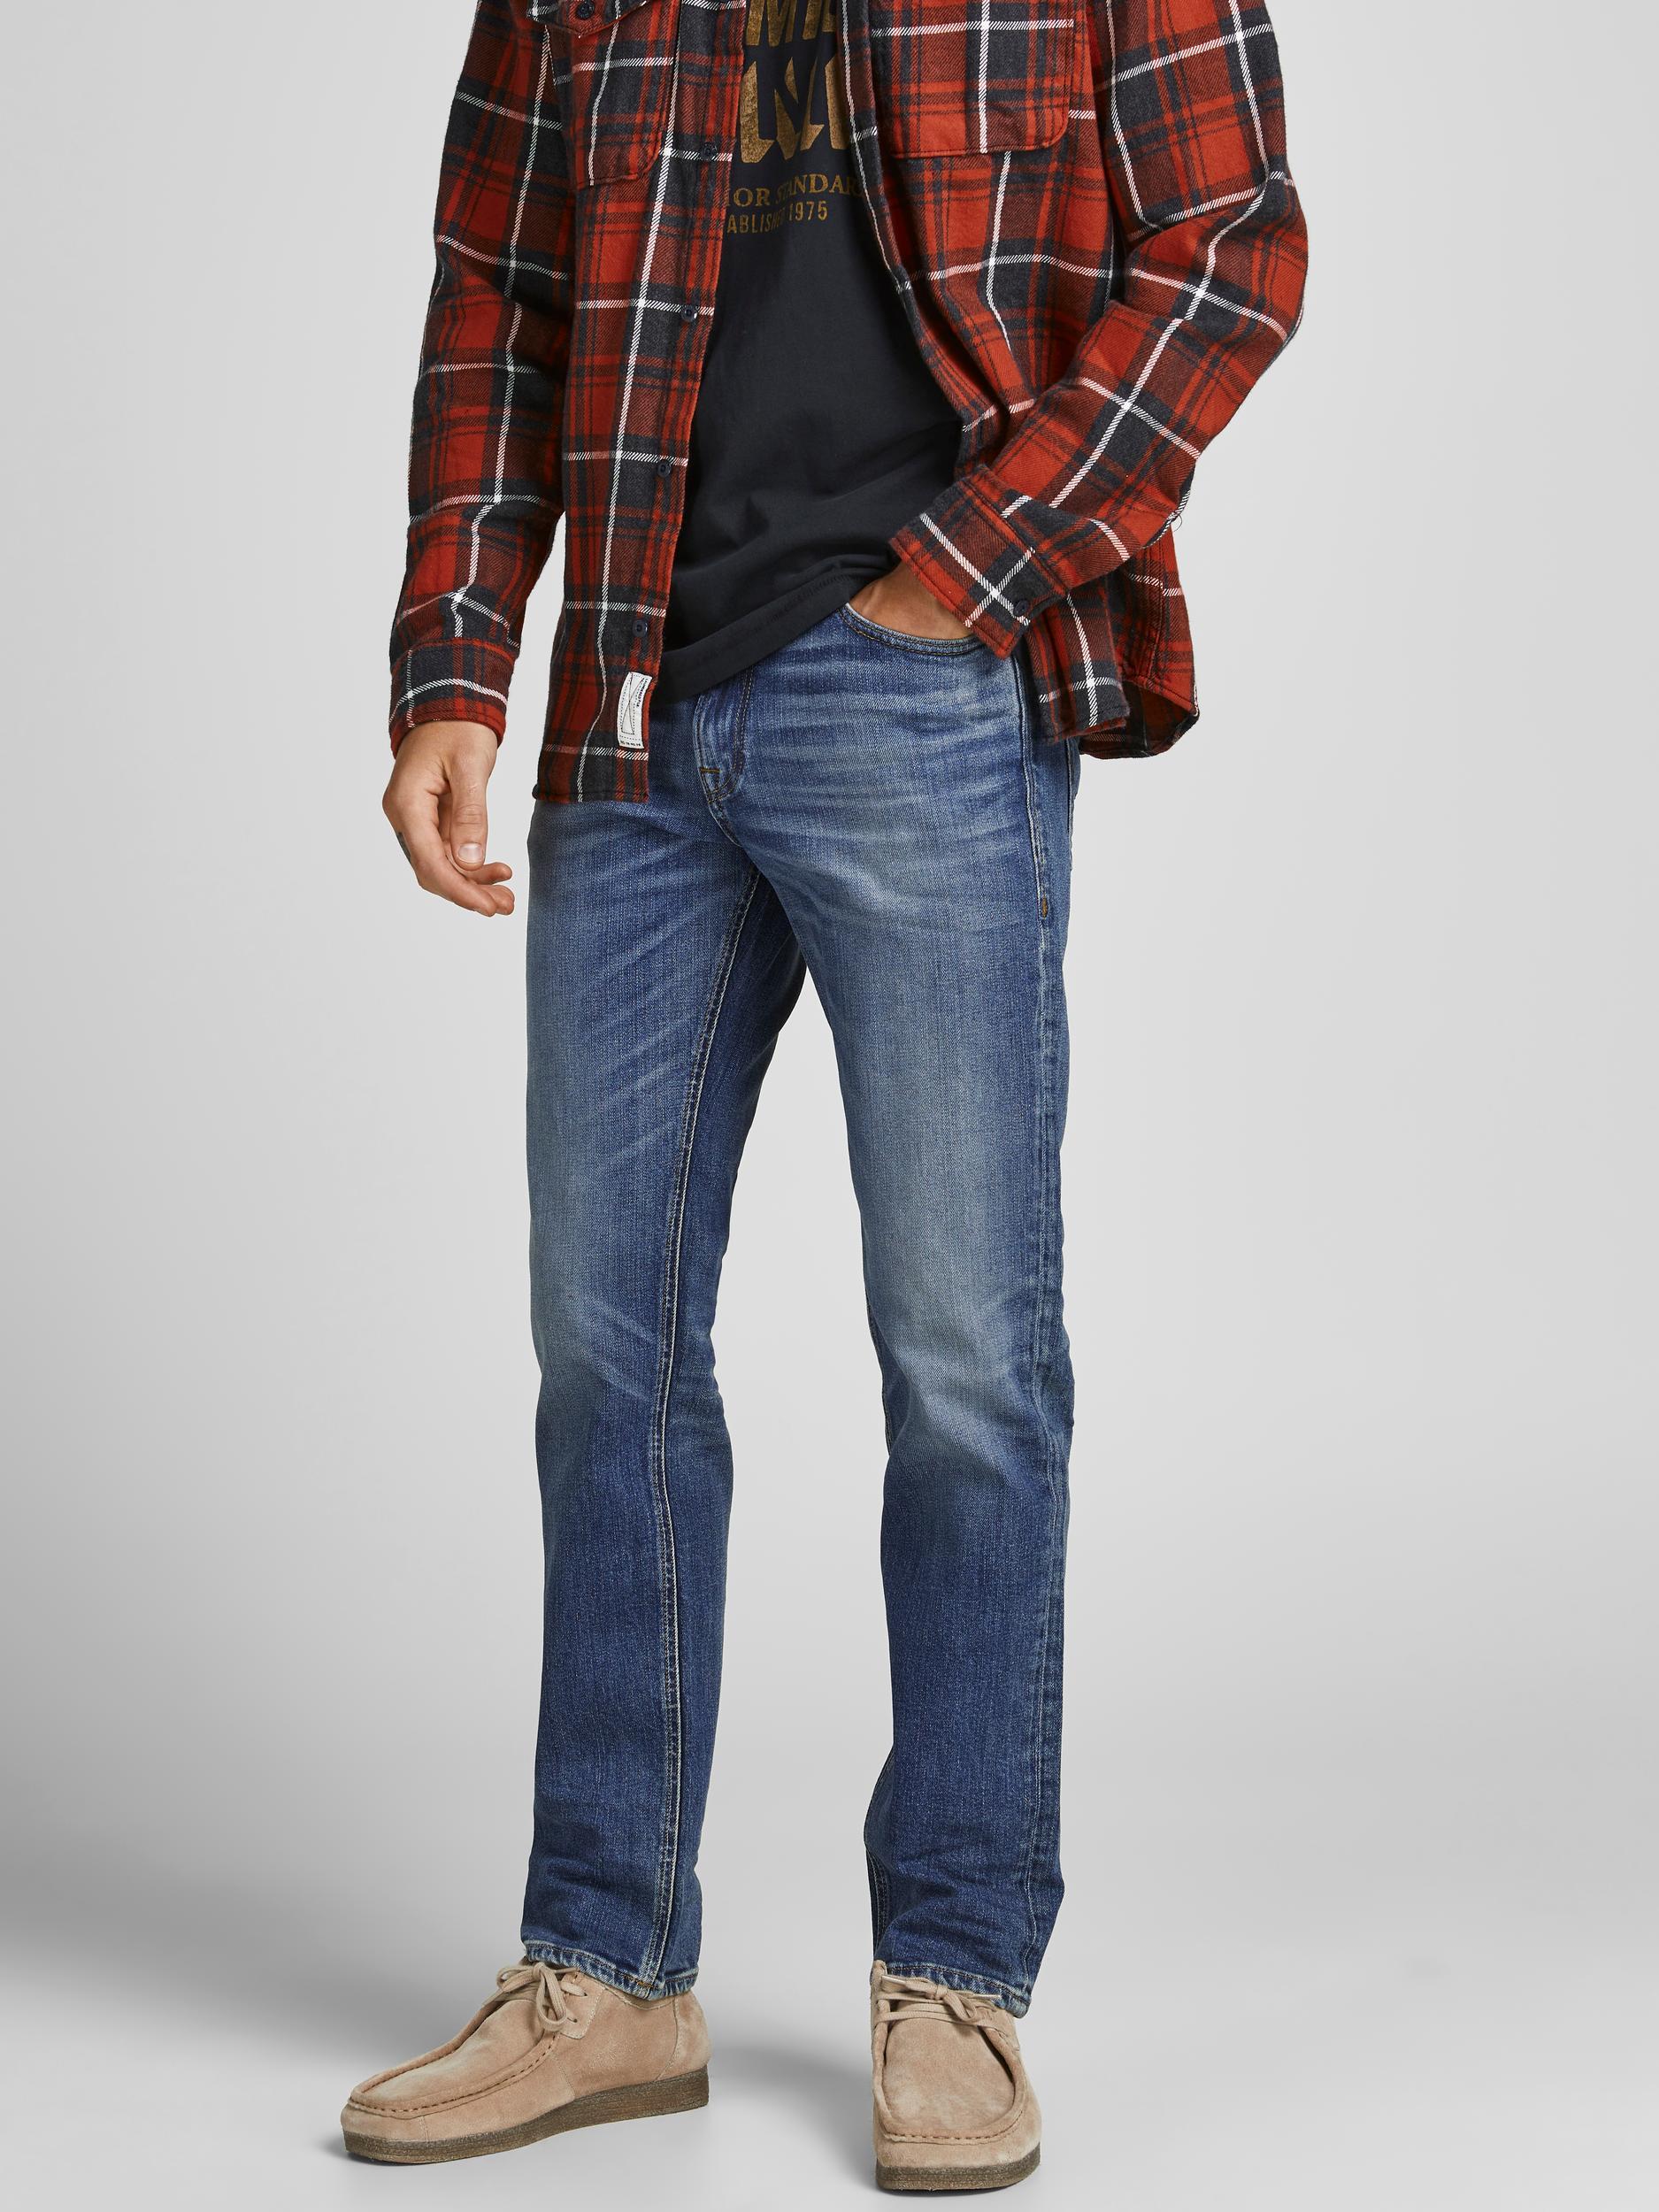 Jack & Jones Clark jeans, blue denim, 33/30